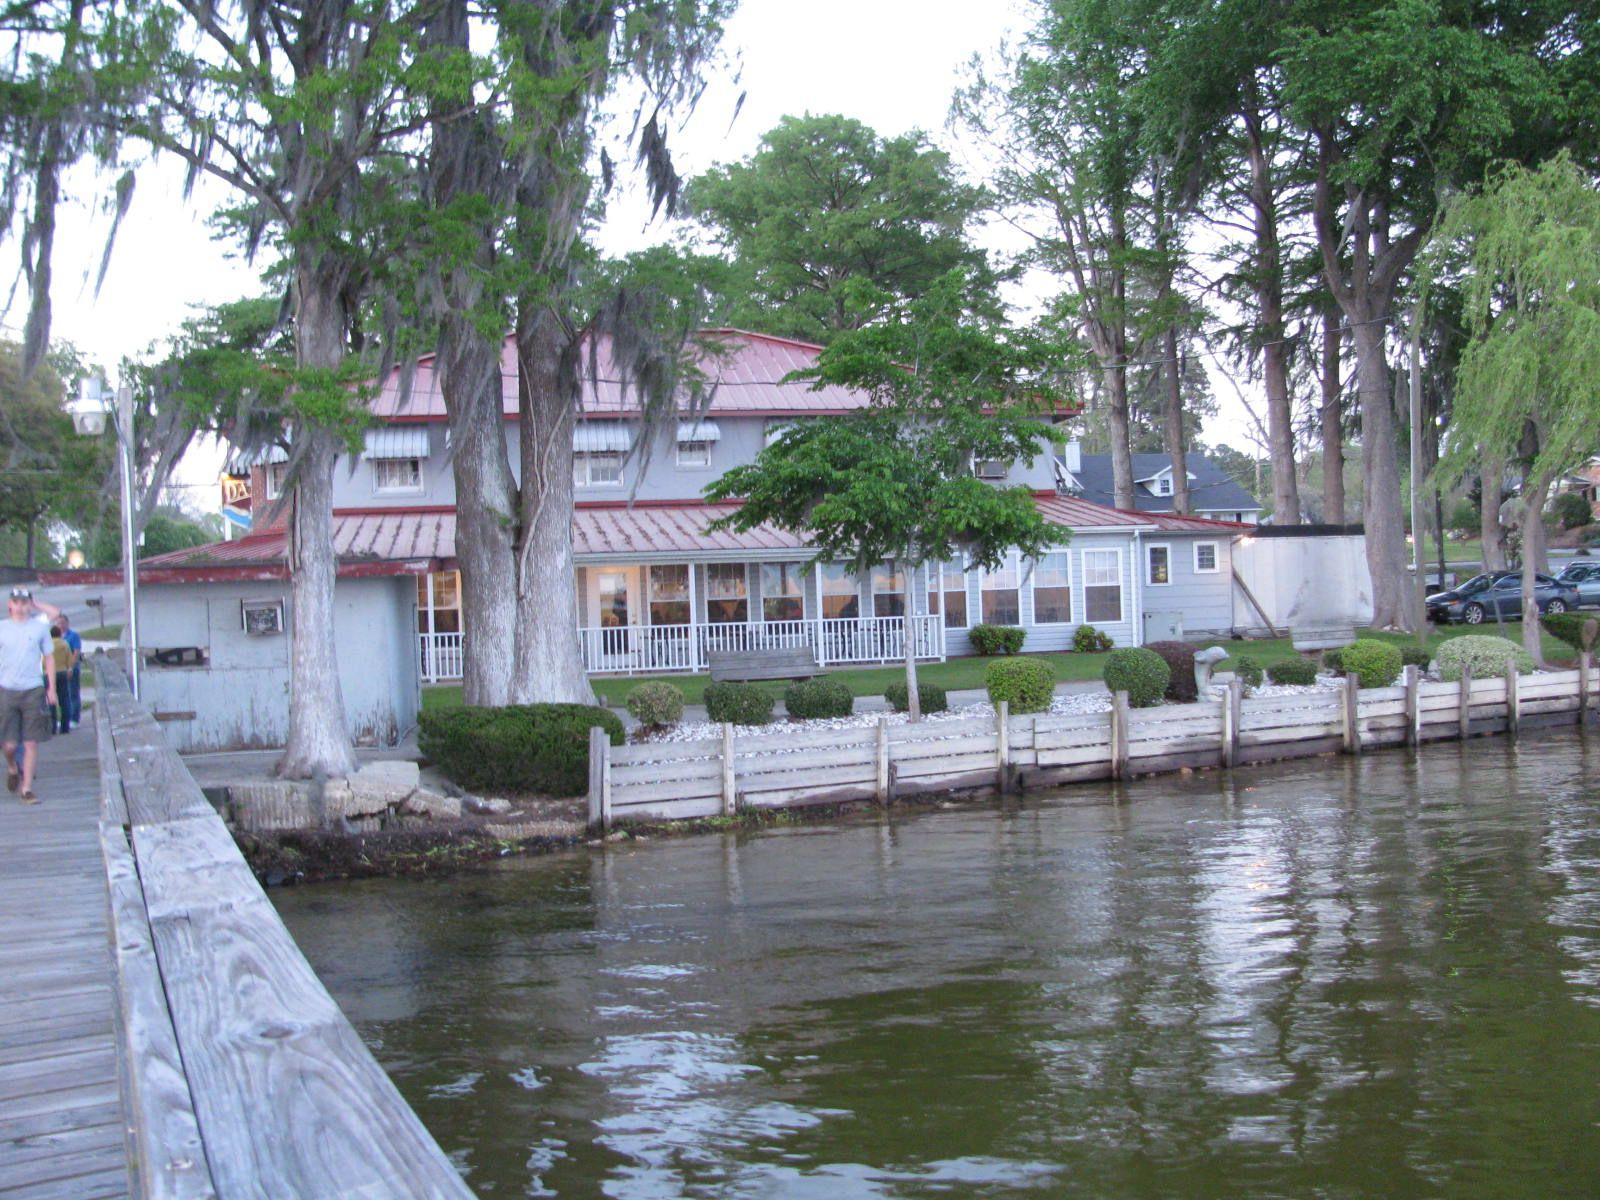 Dales Seafood Lake Waccamaw Nc